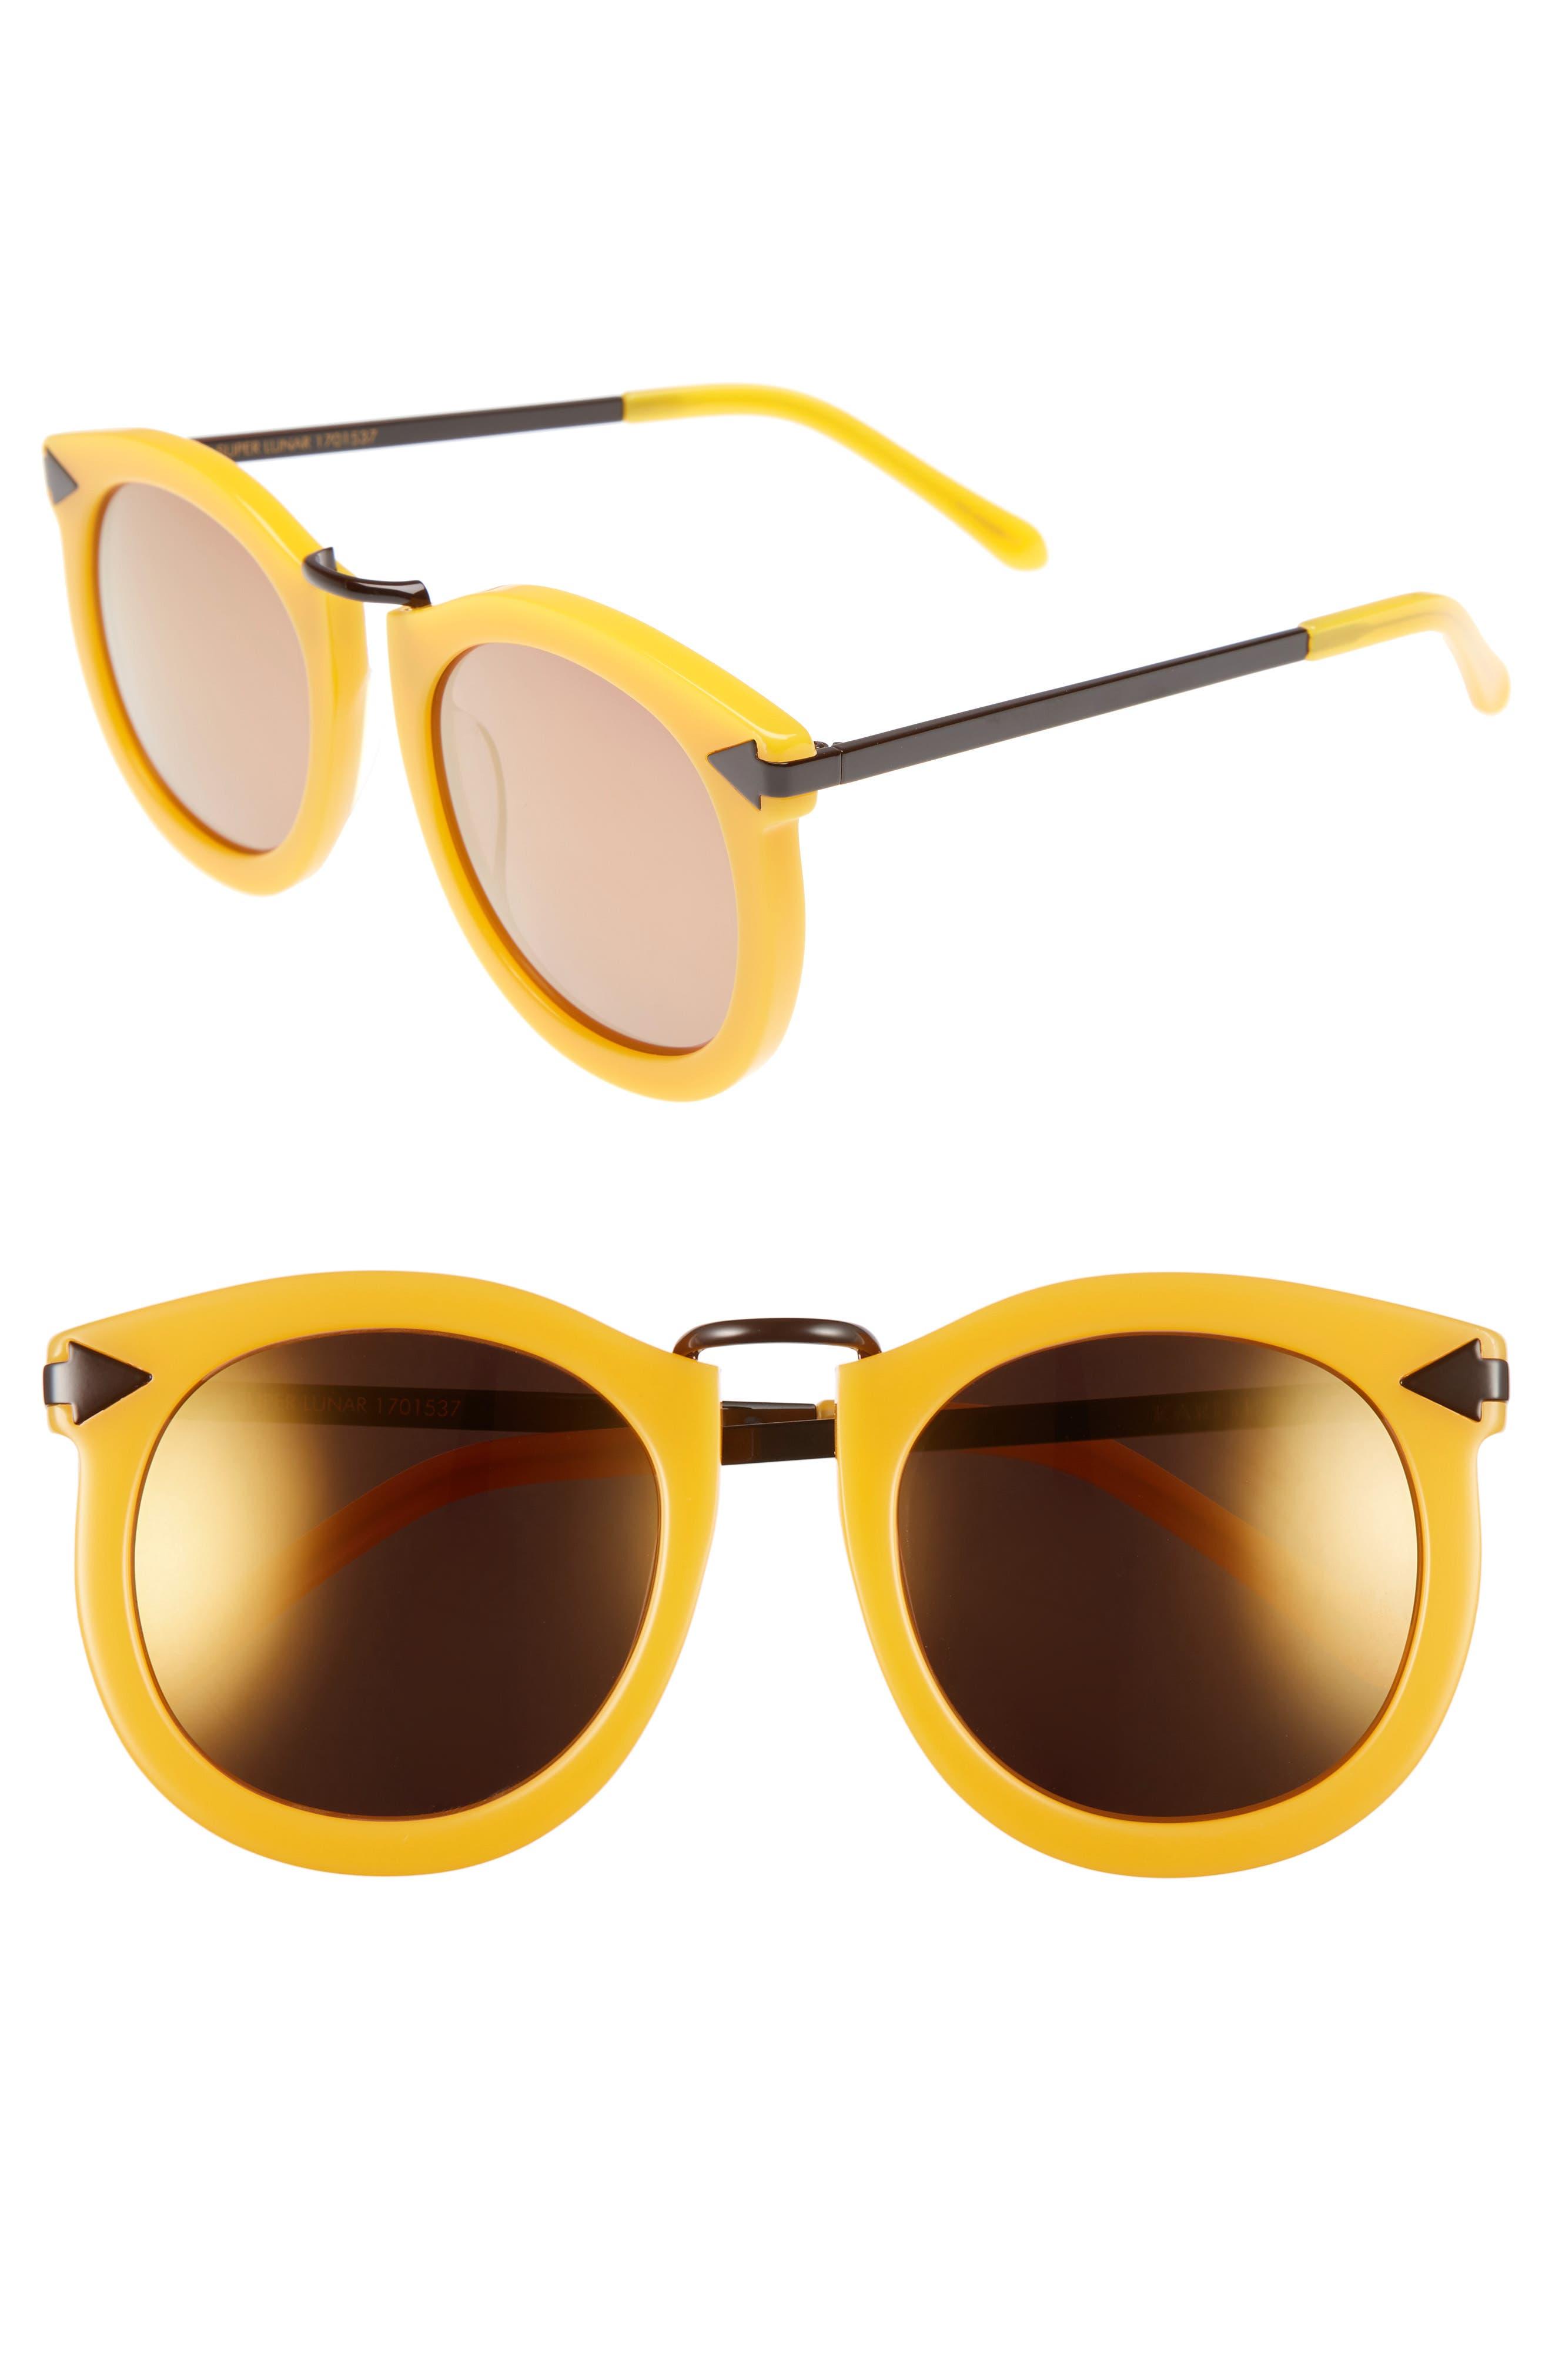 'Super Lunar - Arrowed by Karen' 52mm Sunglasses,                             Main thumbnail 1, color,                             Marigold/ Brown